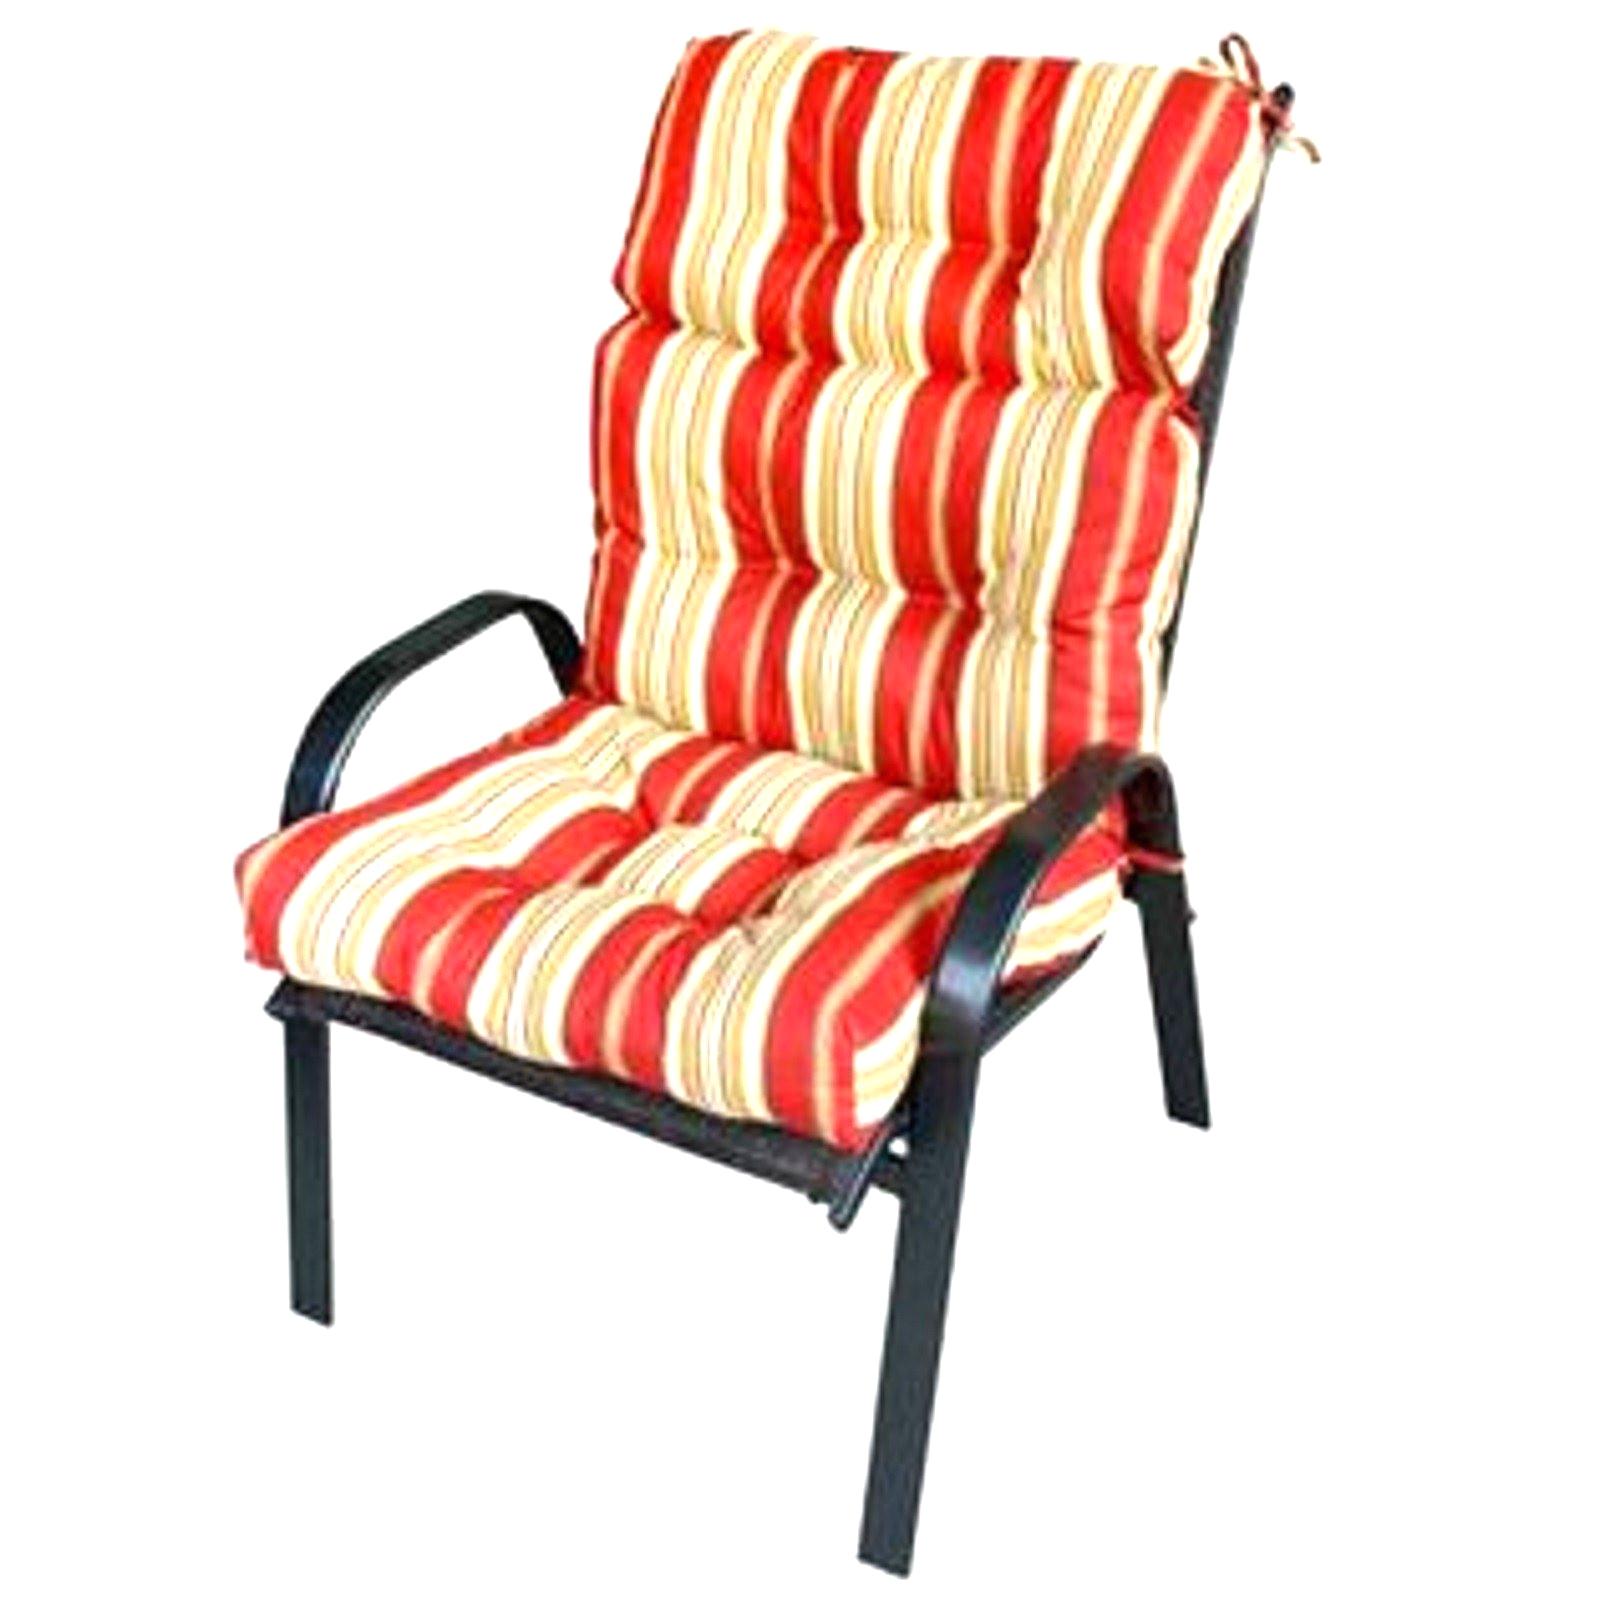 Pink Fluffy Chair Cushion 20 Unique 22×22 Outdoor Chair Cushions Gettwistart